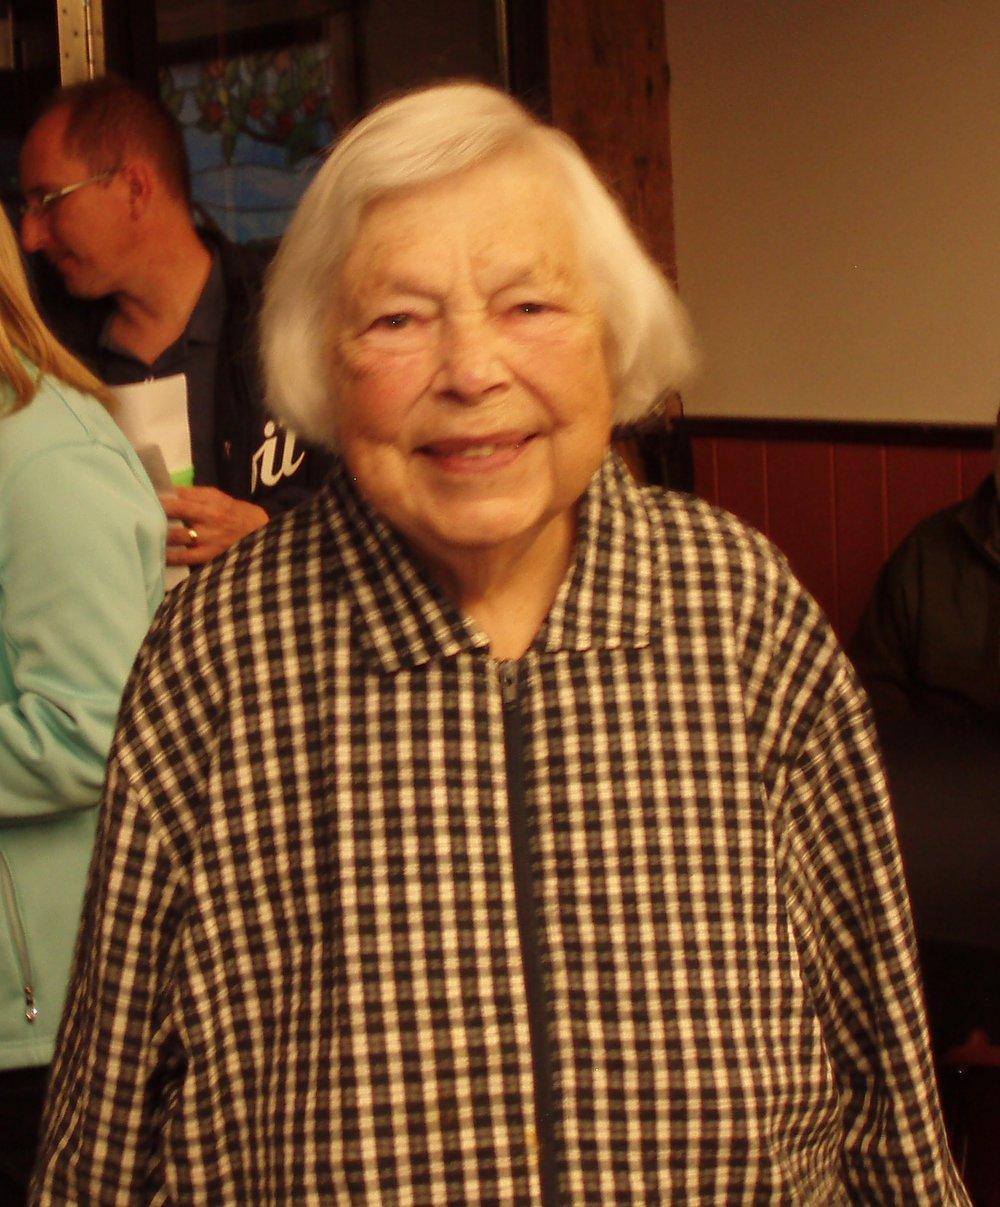 Peggy B. Johnson  November 13, 1928 - March 1, 2019